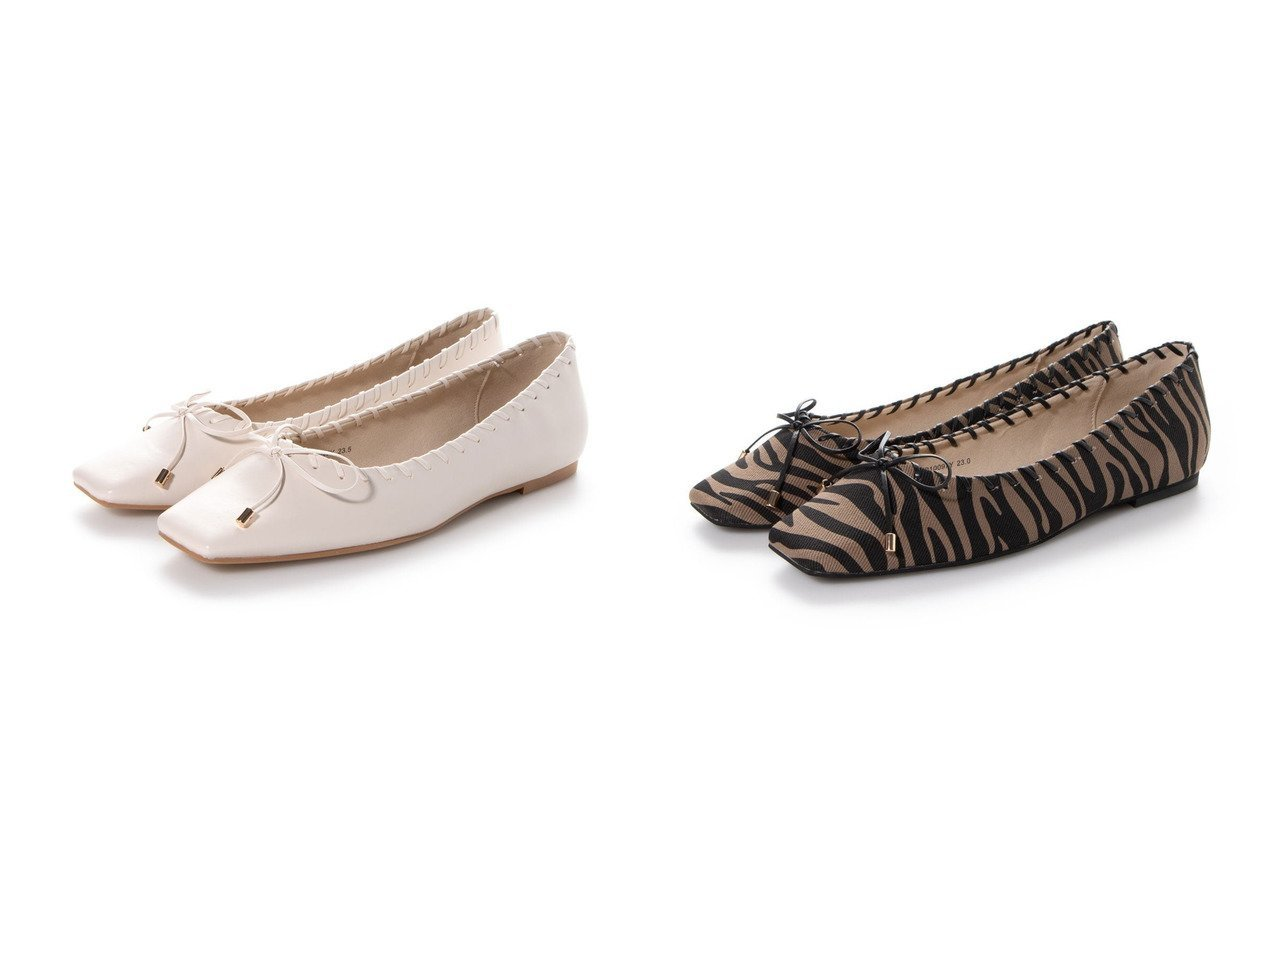 【RANDA/ランダ】のスクエアトゥリボン編みフラットパンプス シューズ・靴のおすすめ!人気、トレンド・レディースファッションの通販 おすすめで人気の流行・トレンド、ファッションの通販商品 メンズファッション・キッズファッション・インテリア・家具・レディースファッション・服の通販 founy(ファニー) https://founy.com/ ファッション Fashion レディースファッション WOMEN 2021年 2021 2021 春夏 S/S SS Spring/Summer 2021 S/S 春夏 SS Spring/Summer トレンド フラット ライニング リボン 今季 春 Spring |ID:crp329100000023927